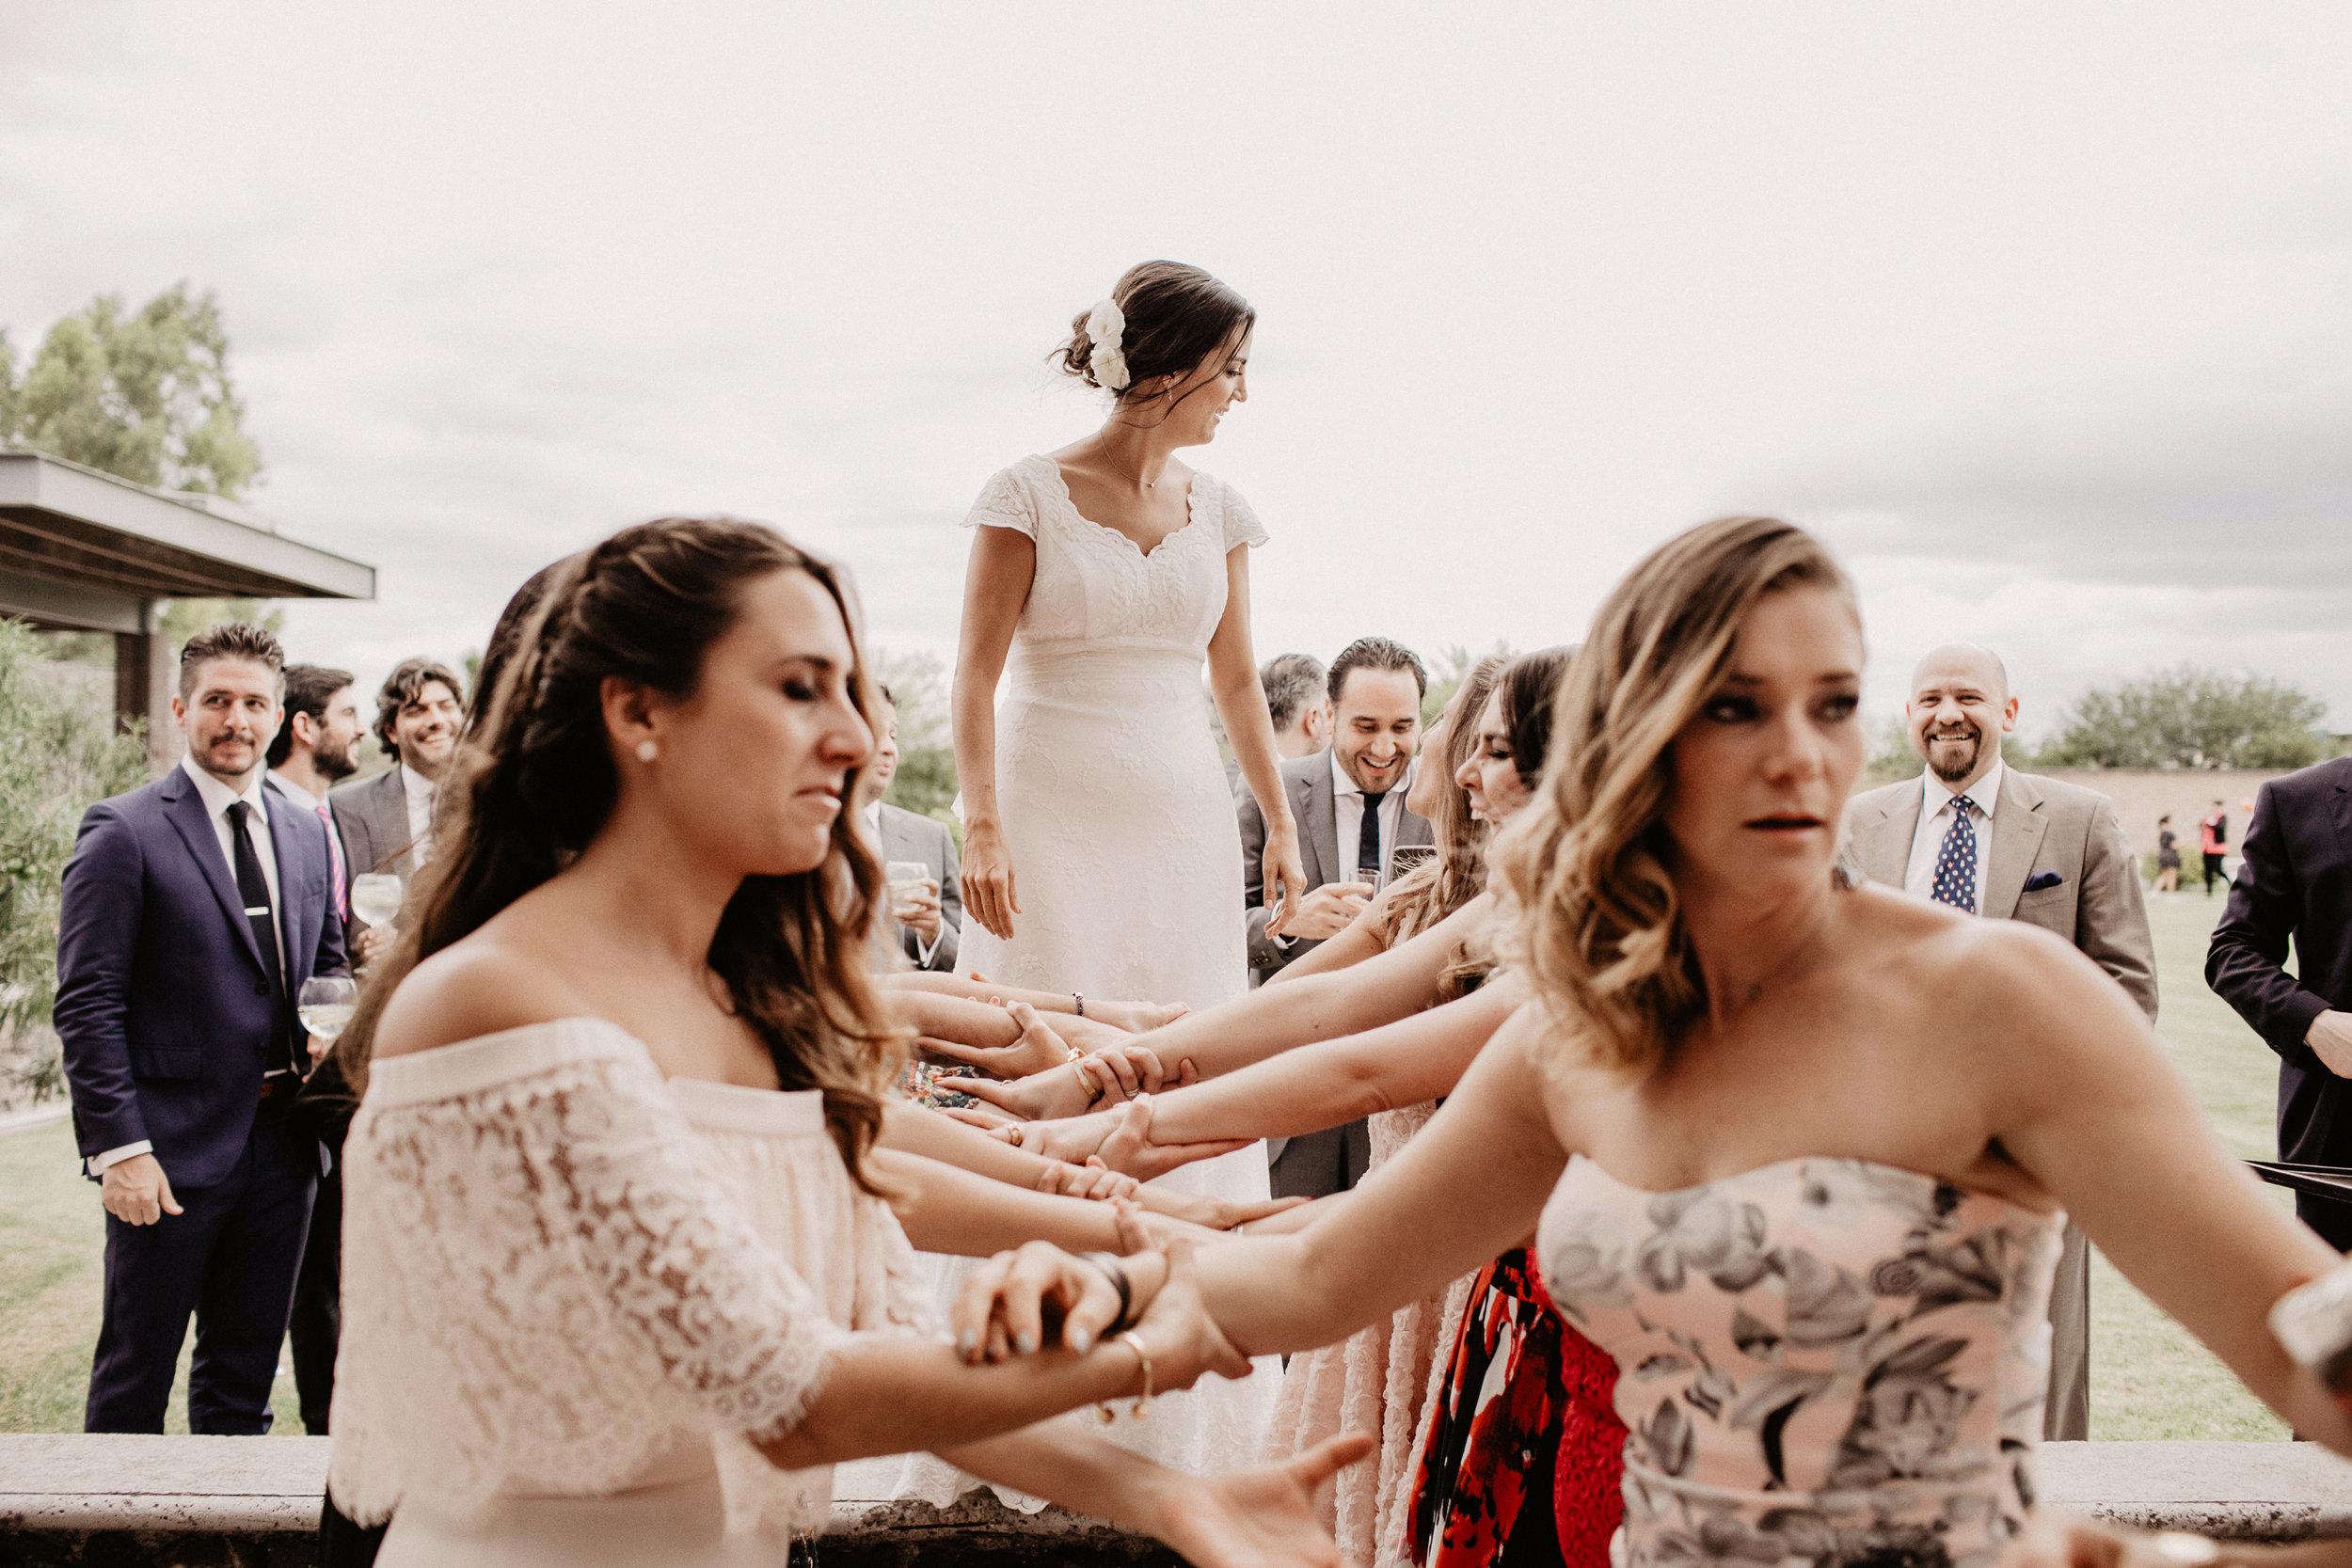 alfonso_flores_destination_wedding_photographer_pau_alonso_951.JPG